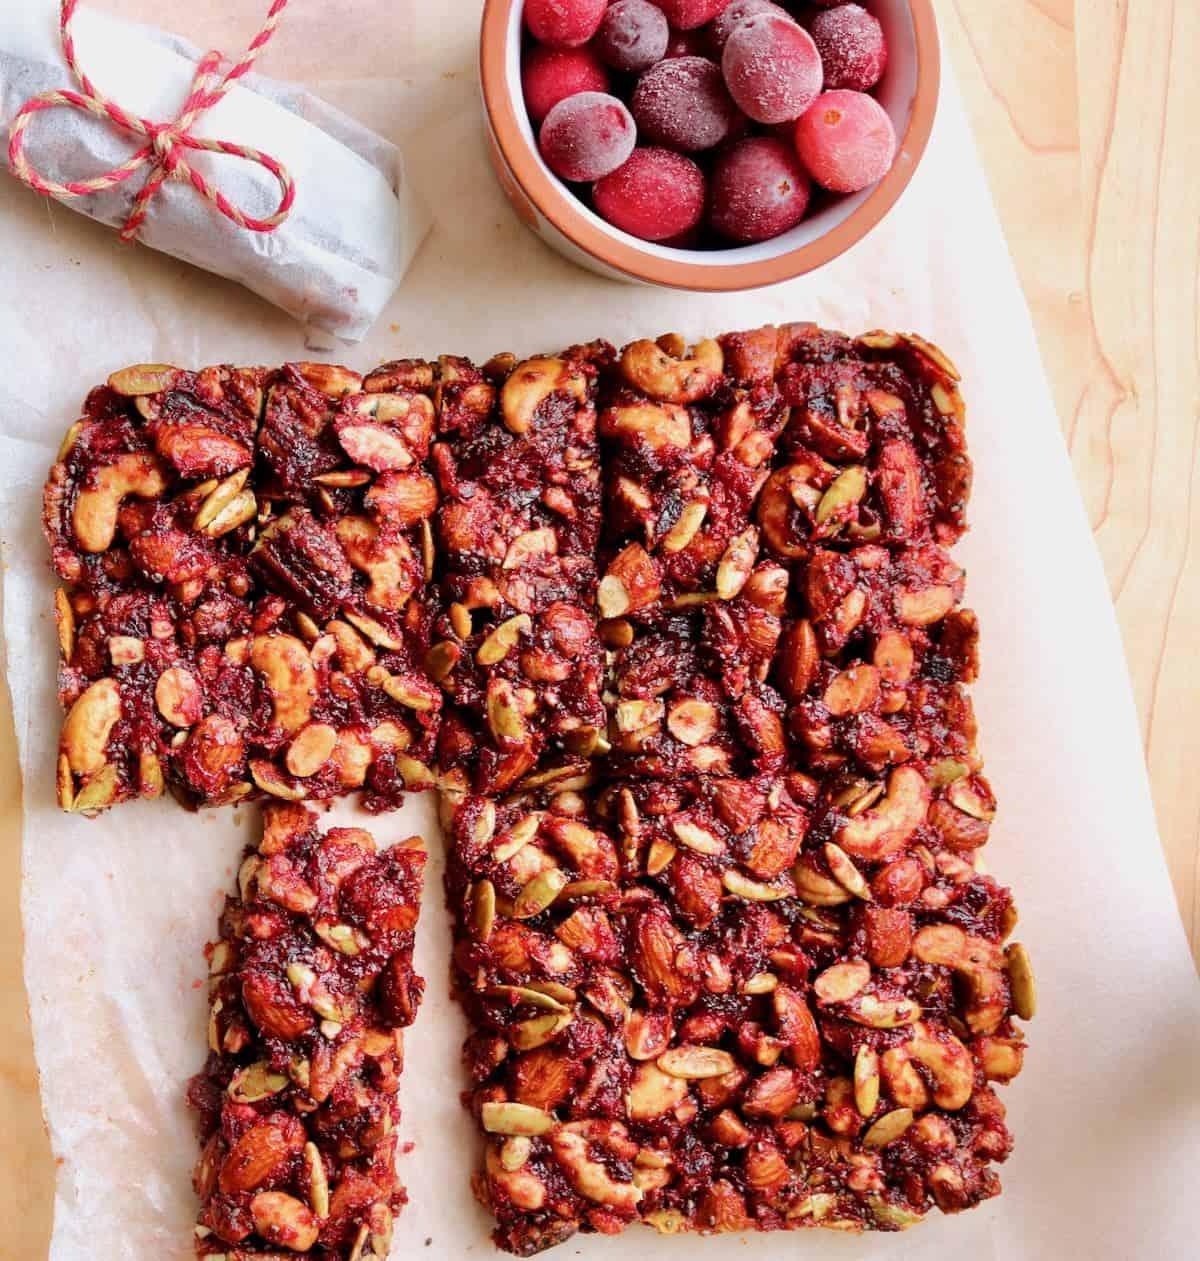 wrapped bars, sliced bars, fresh cranberries